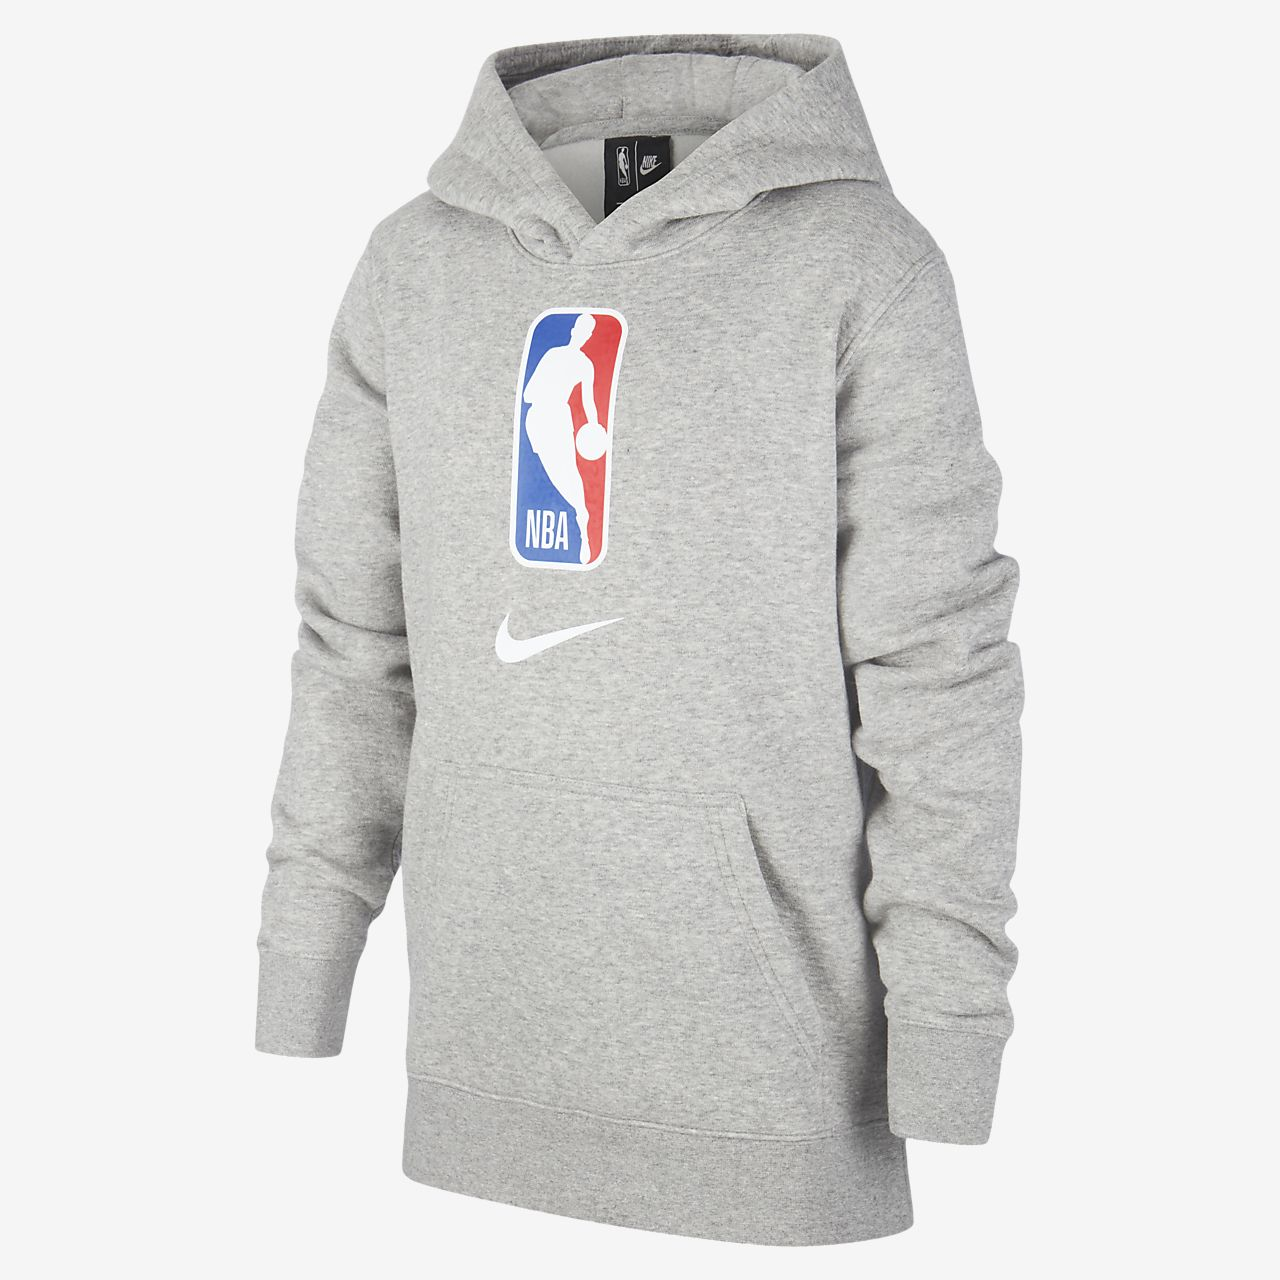 Team 31 Dessuadora amb caputxa Nike NBA - Nen/a